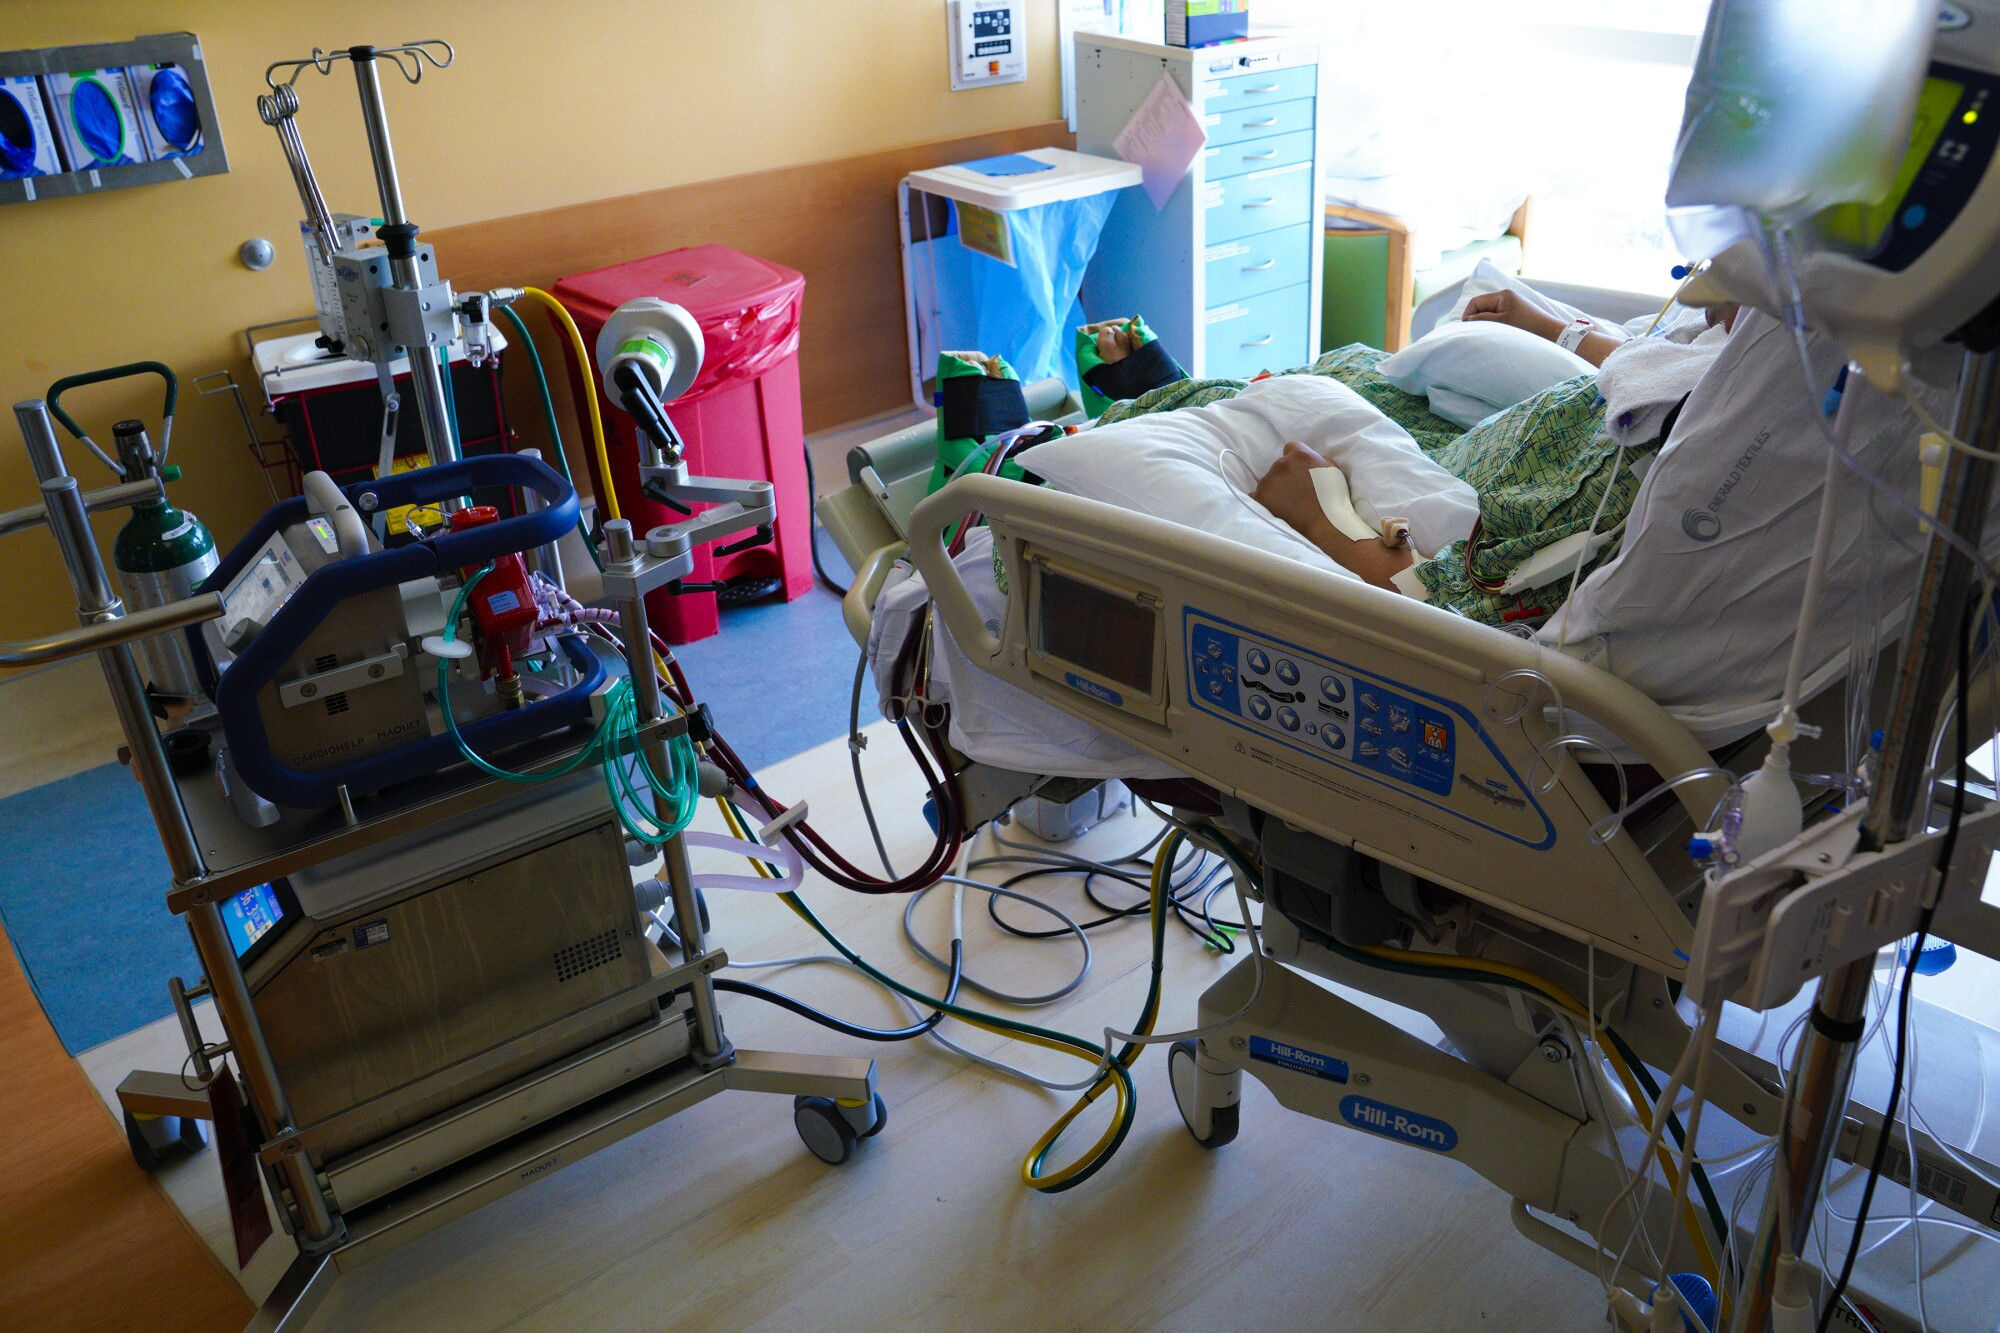 At Scripps Memorial Hospital La Jolla, a COVID patient on ECMO (extracorporeal membrane oxygenation).